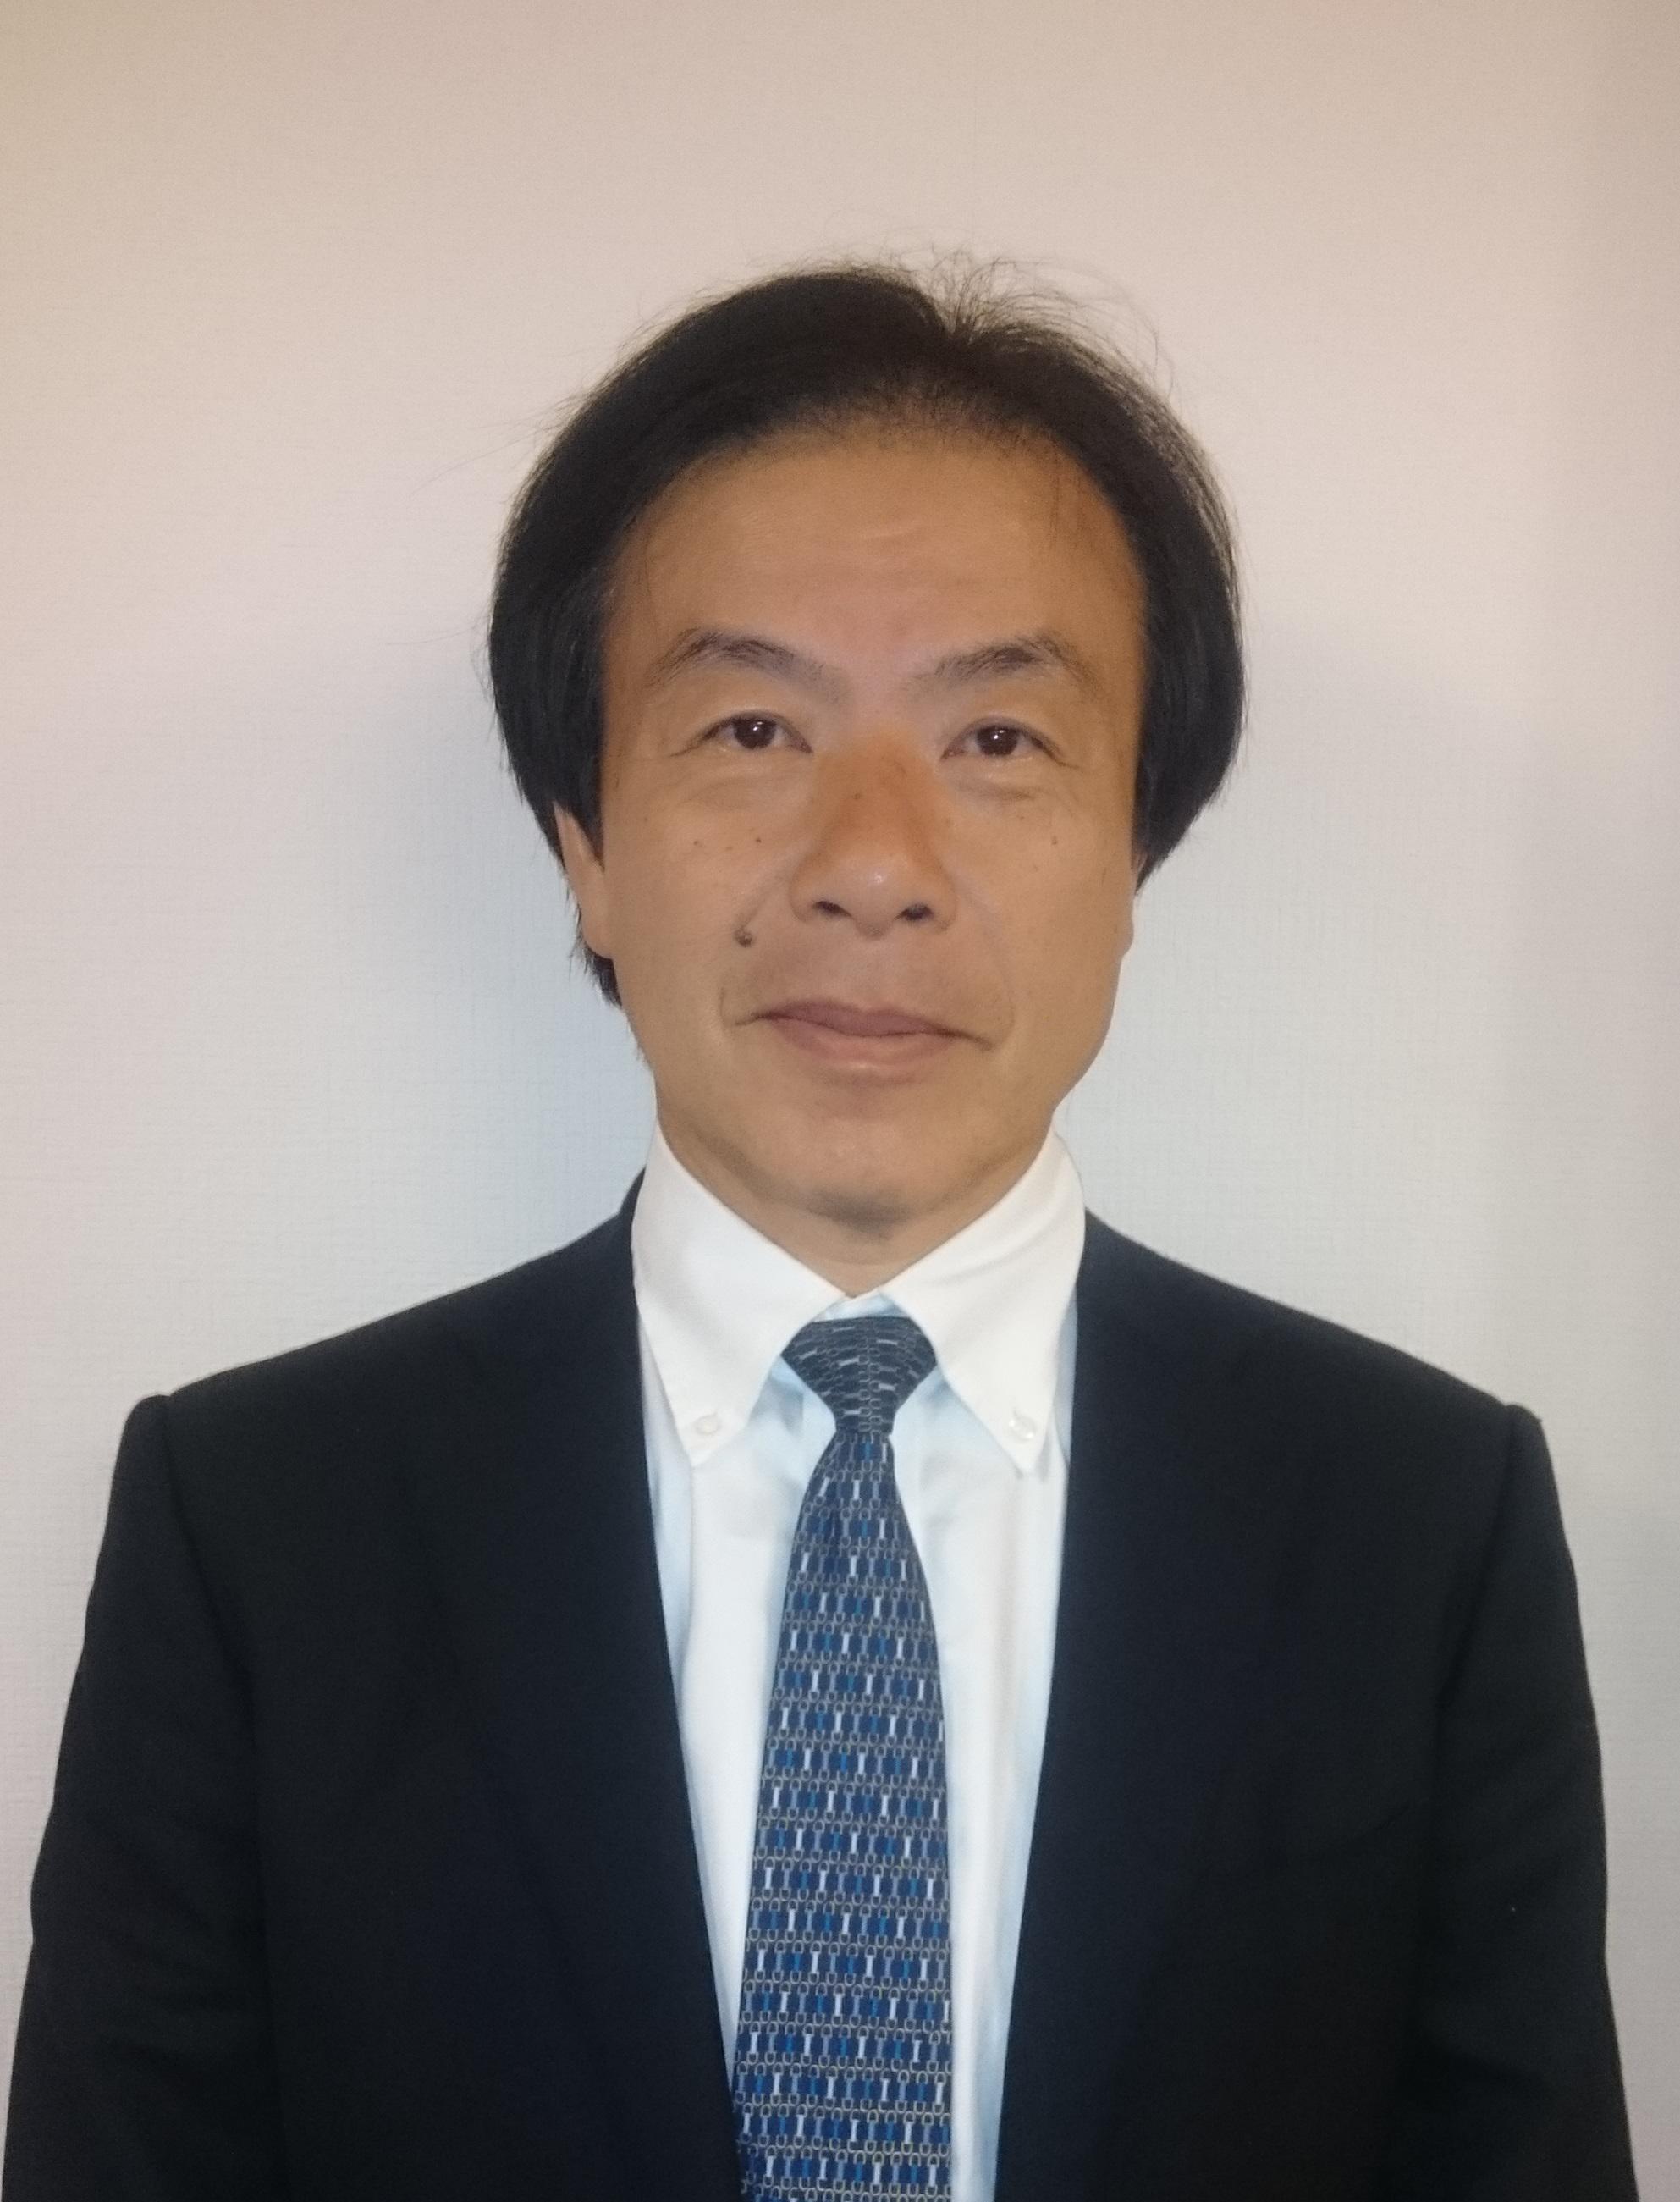 教職センター長代行 橋口 剛夫 教授